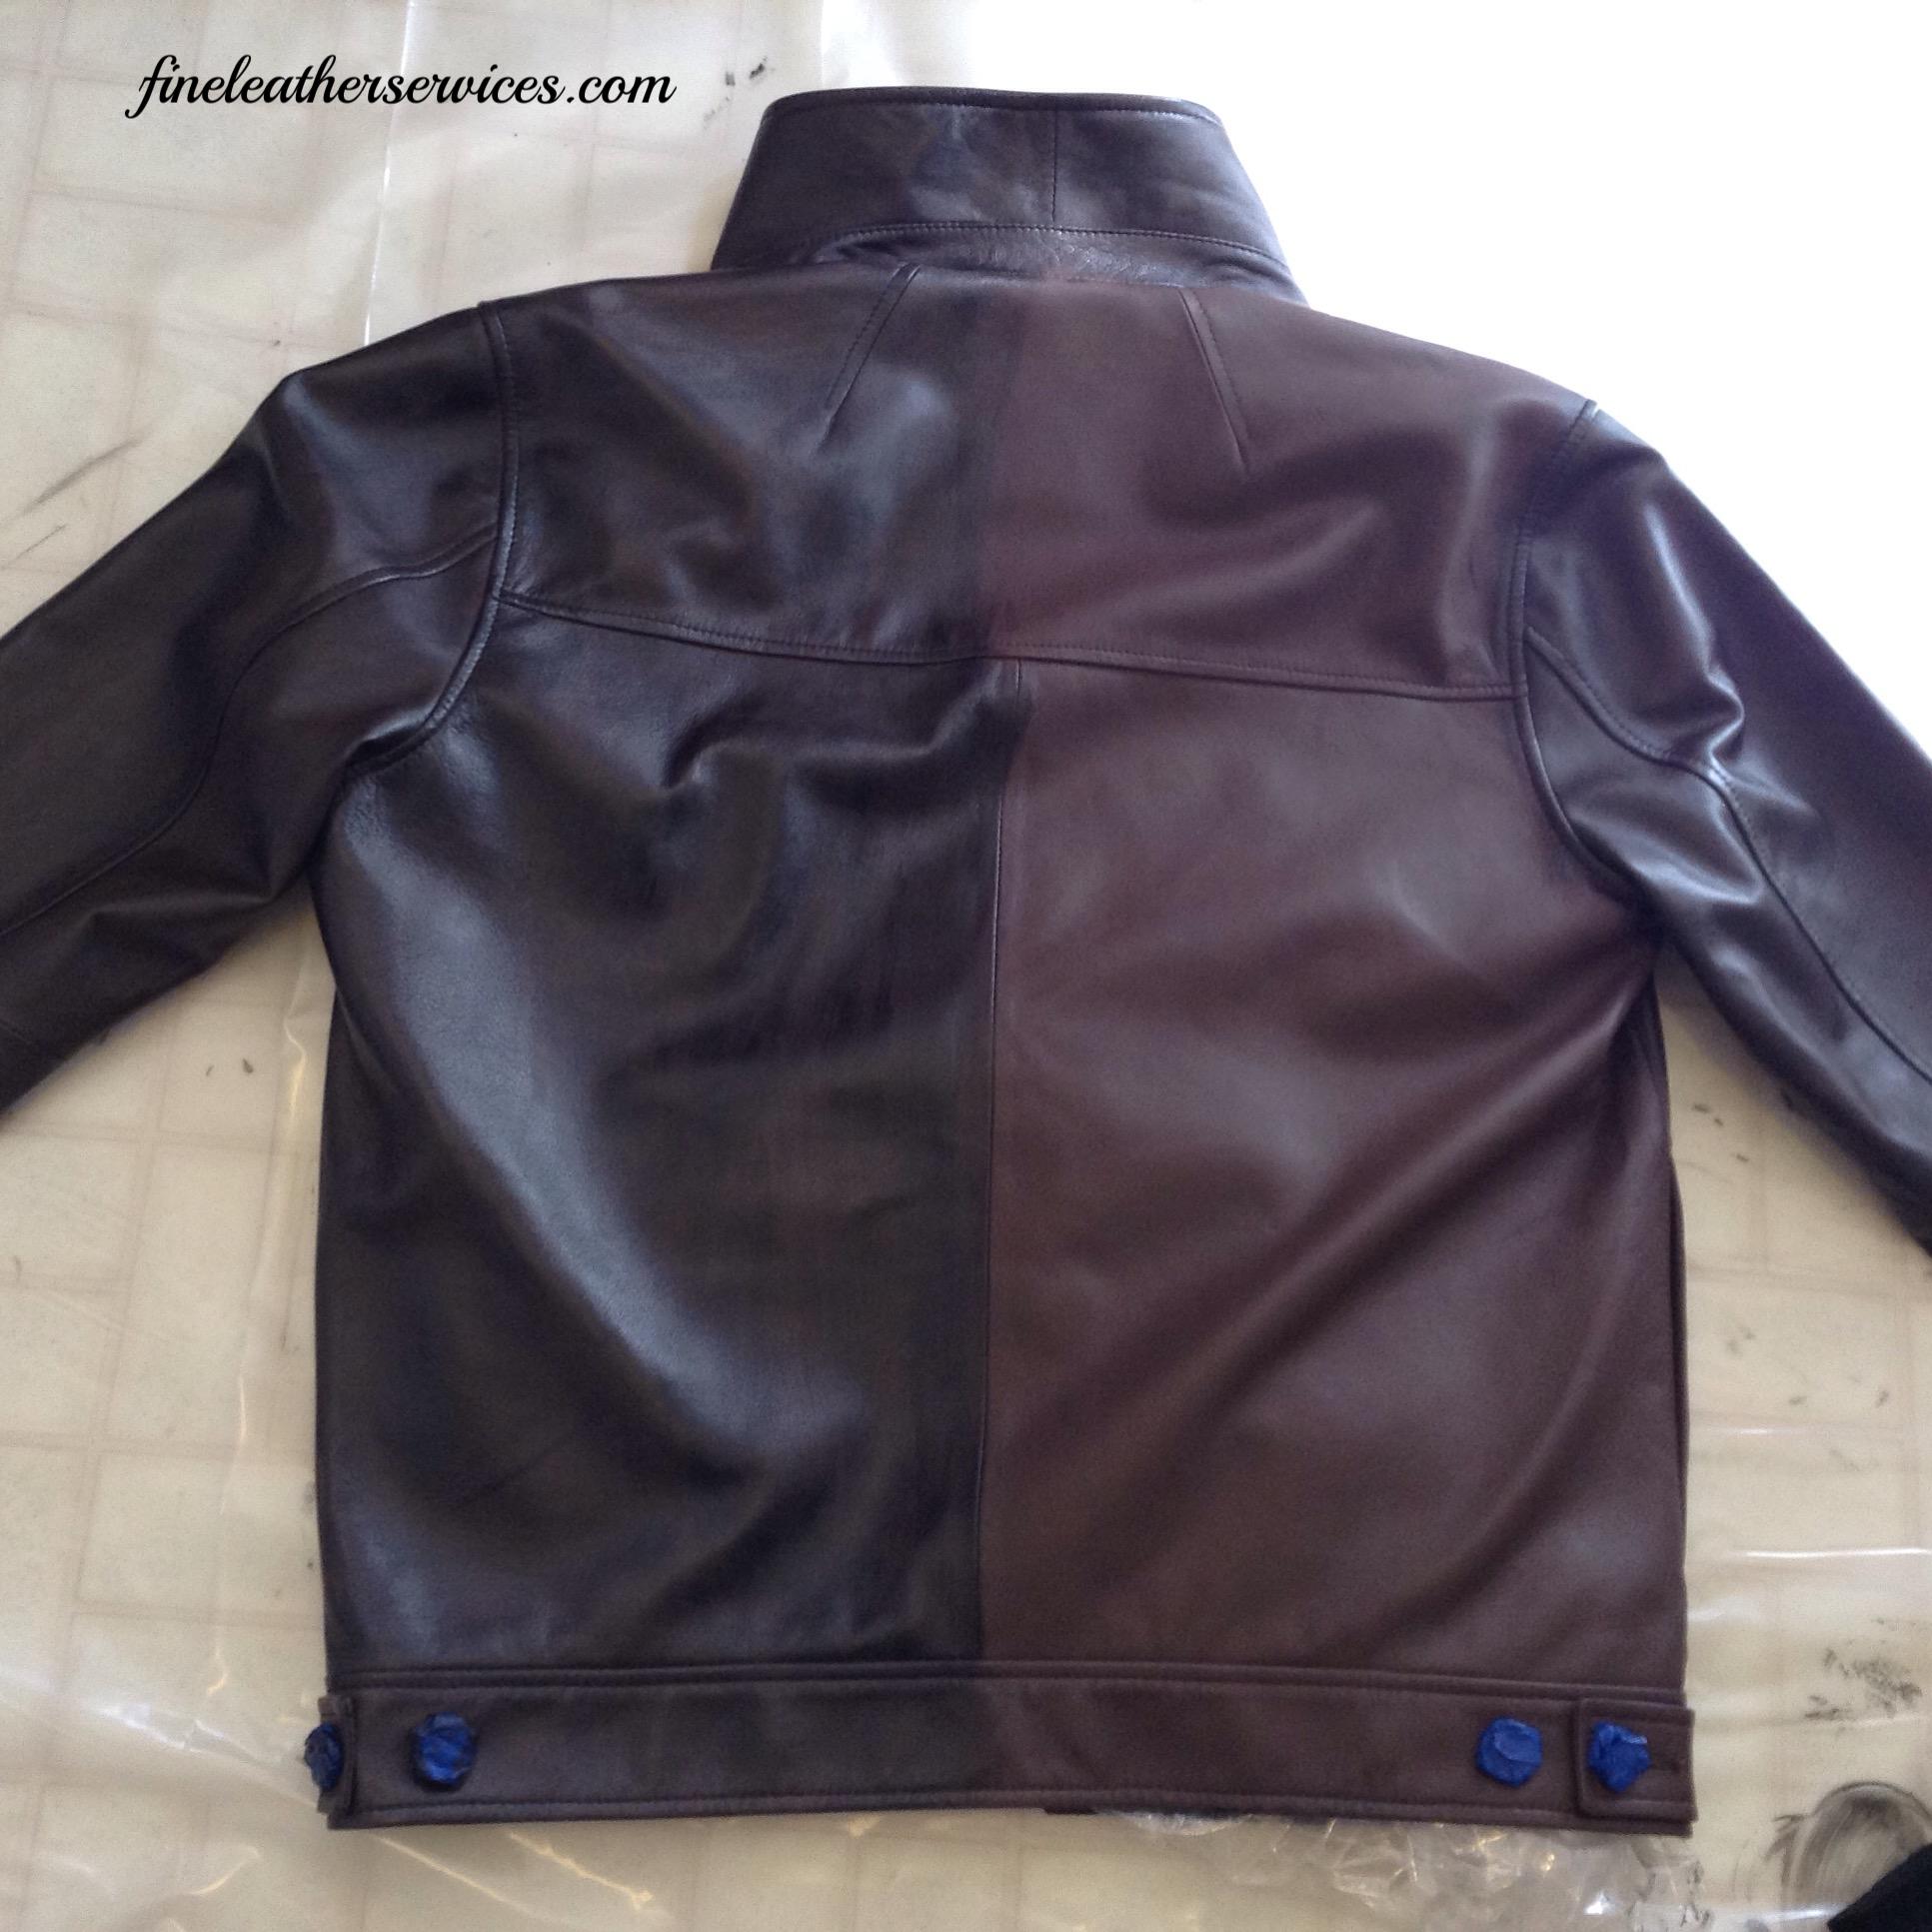 "Color change for a showroom ""concept"" jacket."